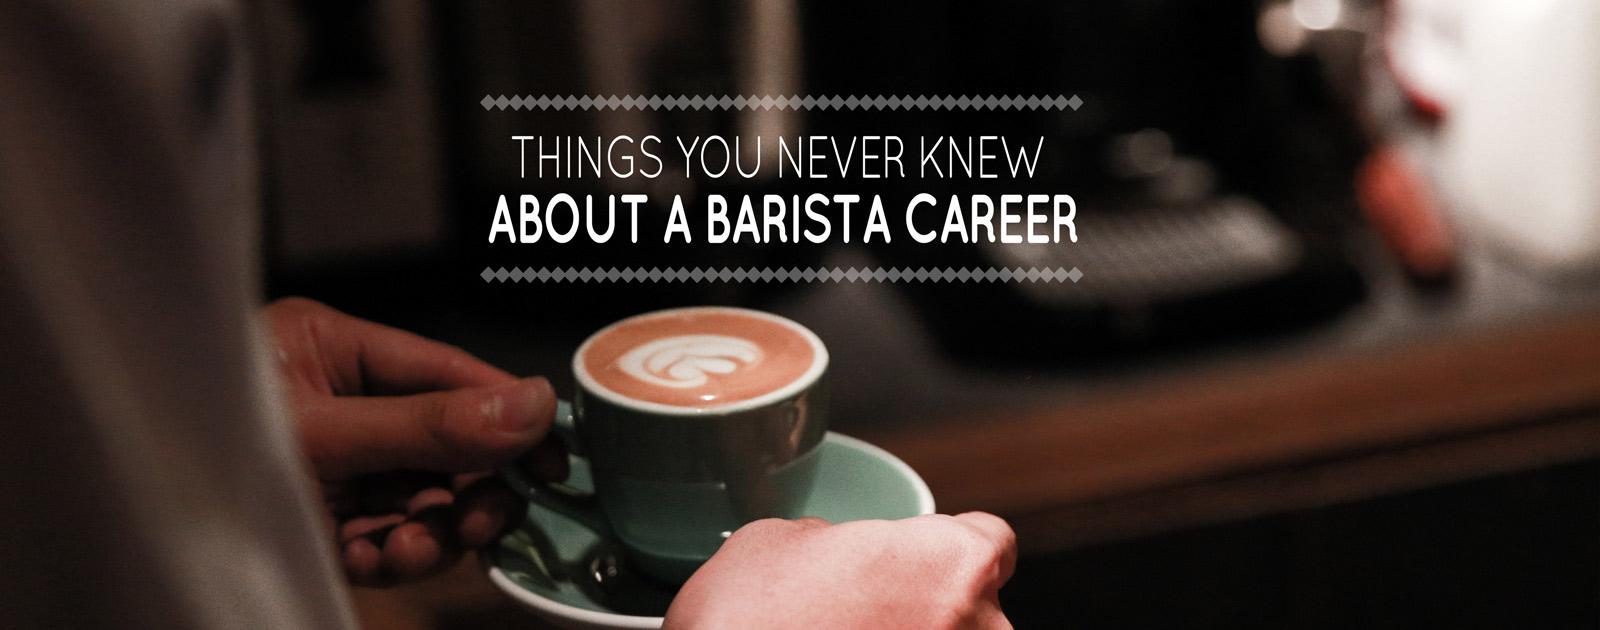 cafehoppingsg-barista-banner.jpg